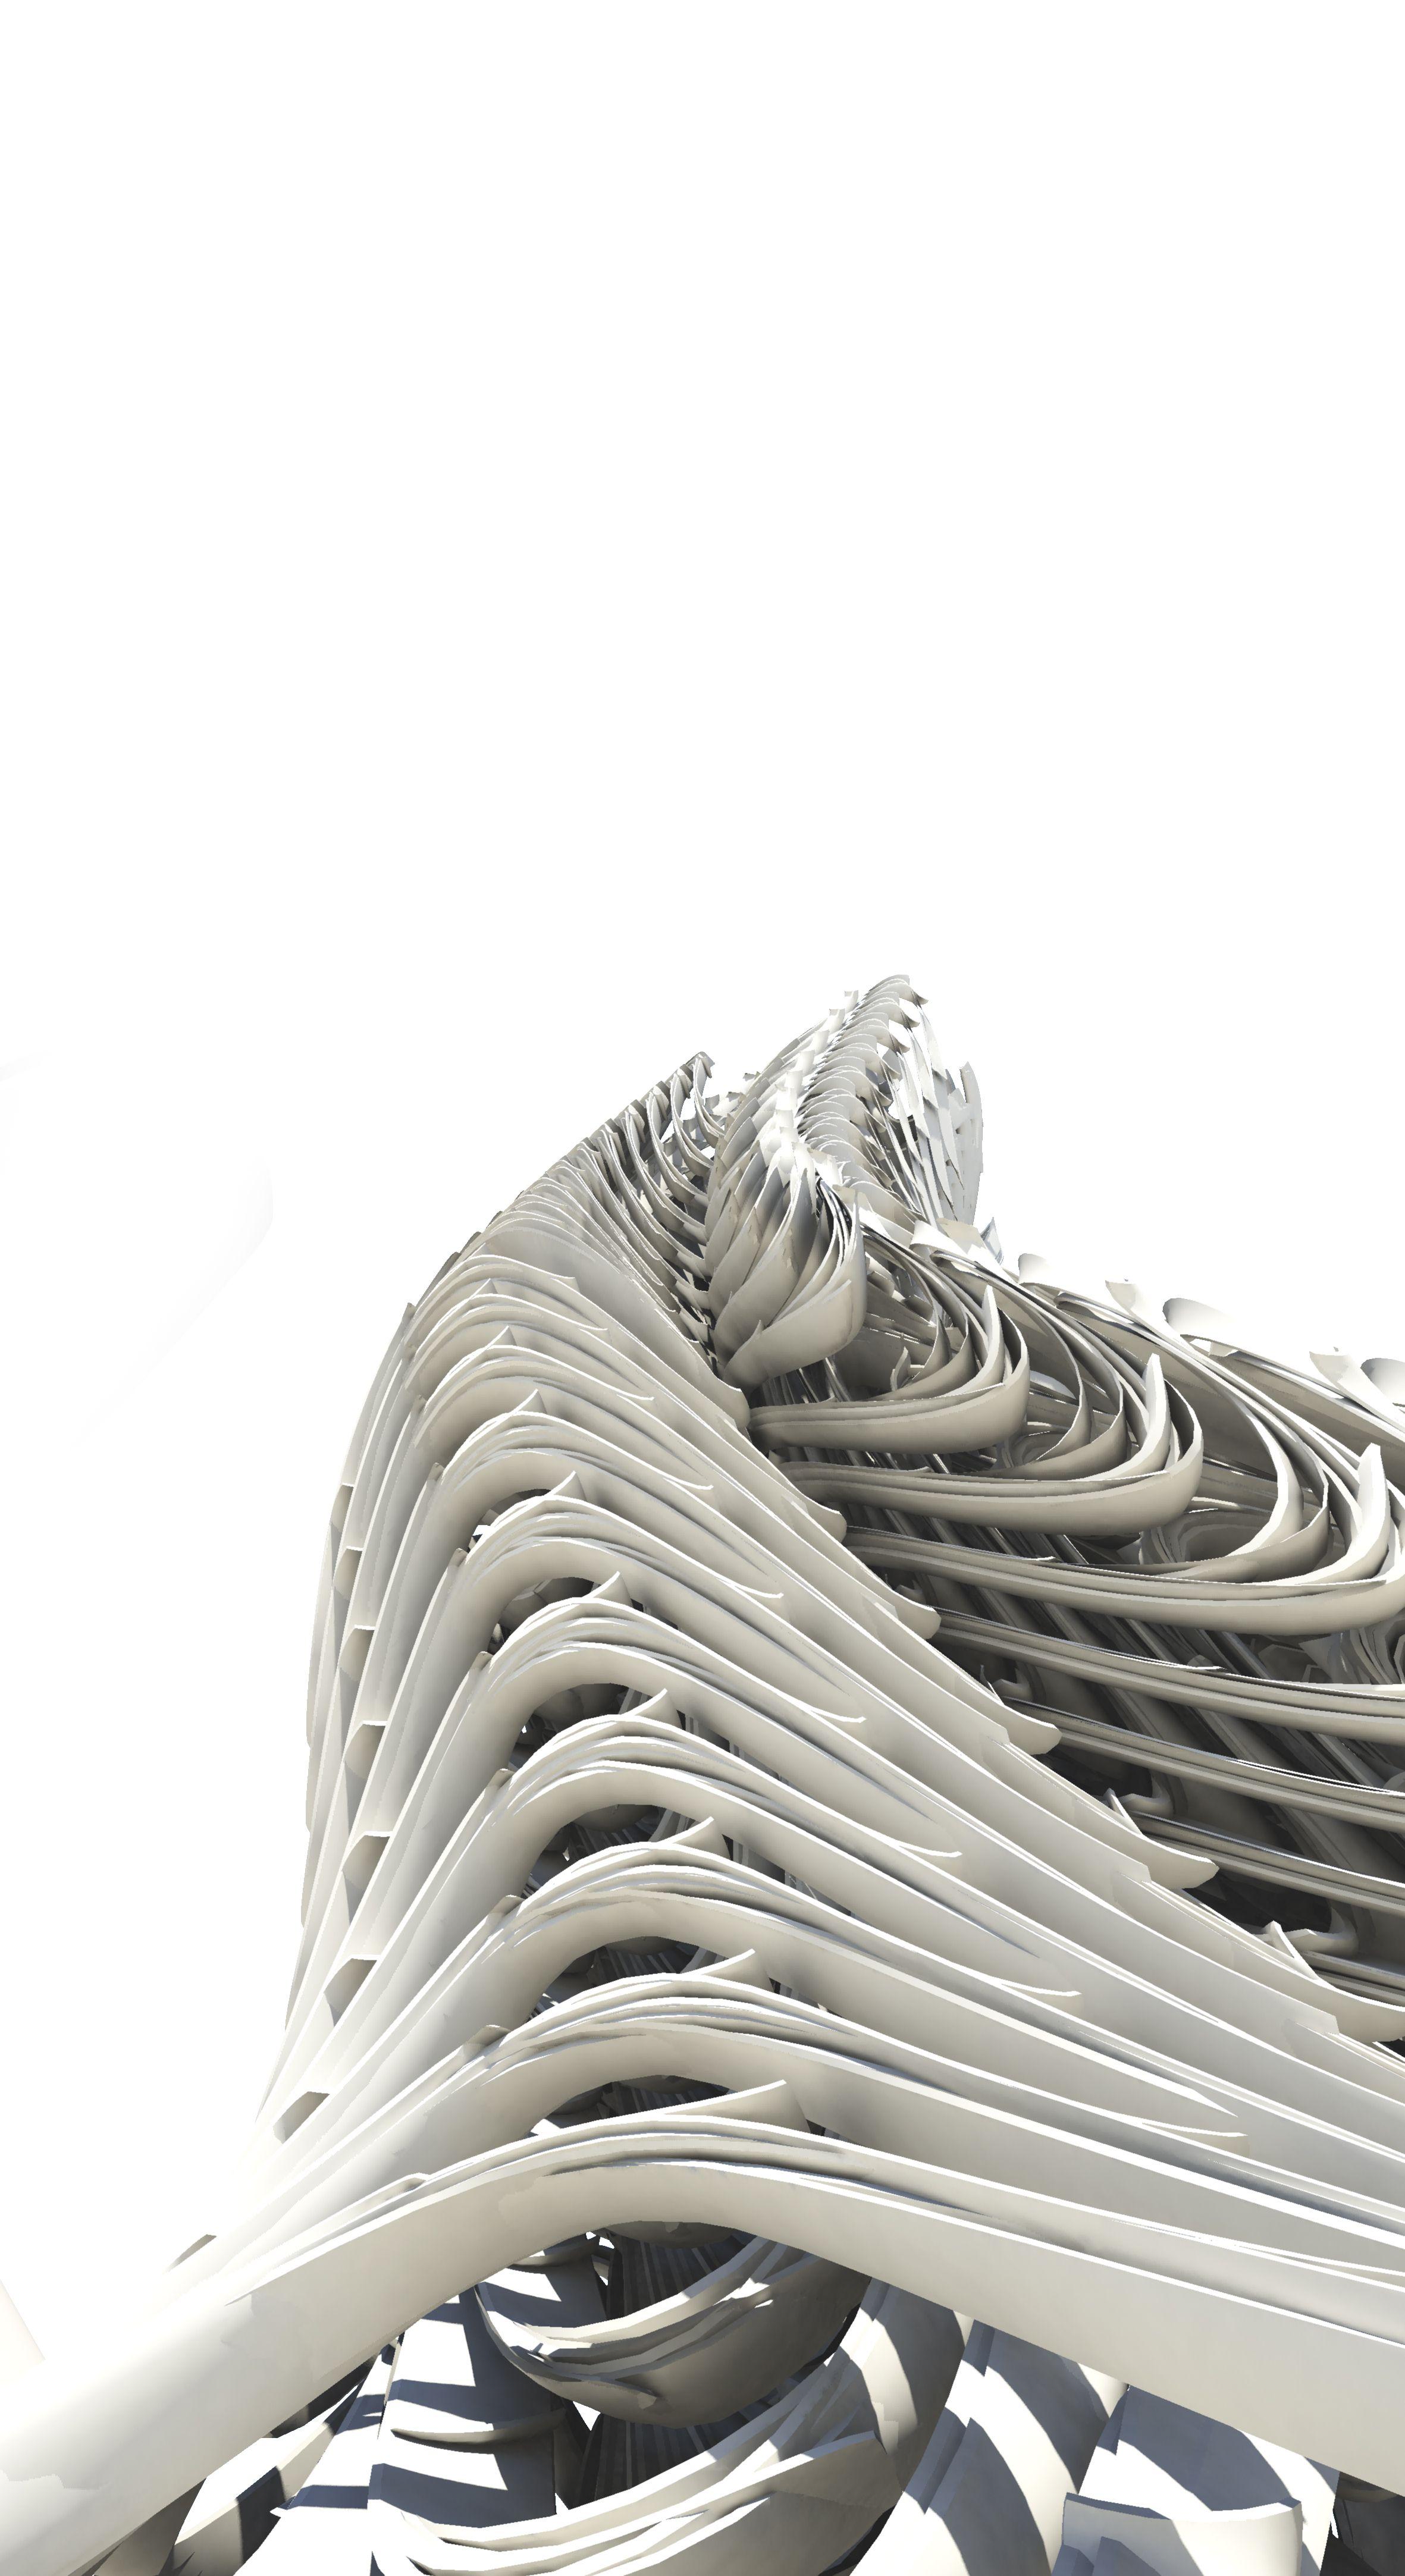 Minimal skeleton roxy rahel studio zaha hadid vienna m s for Parametric architecture zaha hadid